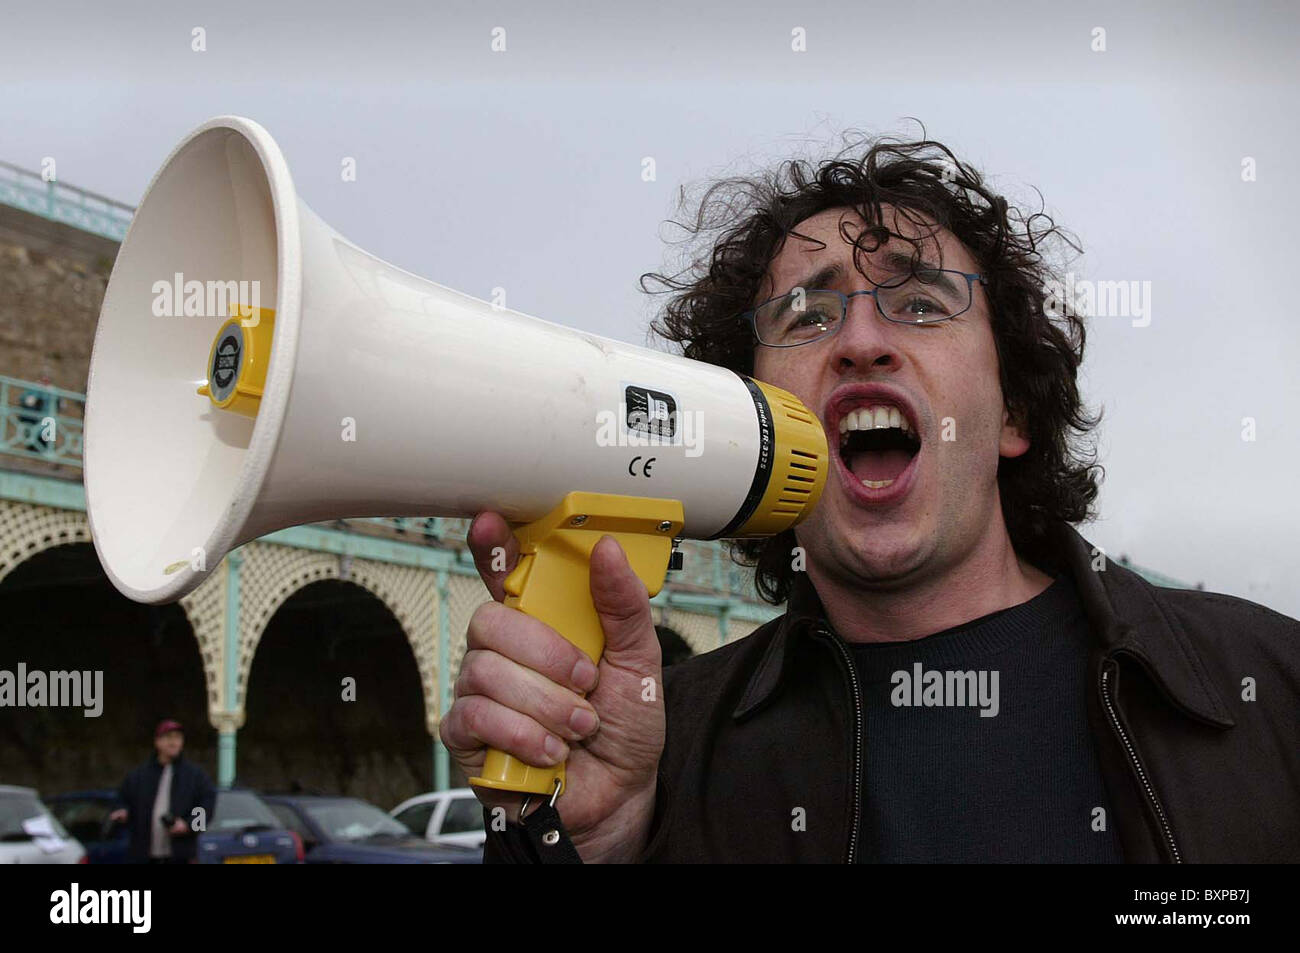 British comedian Steve Coogan. Picture by James Boardman - Stock Image